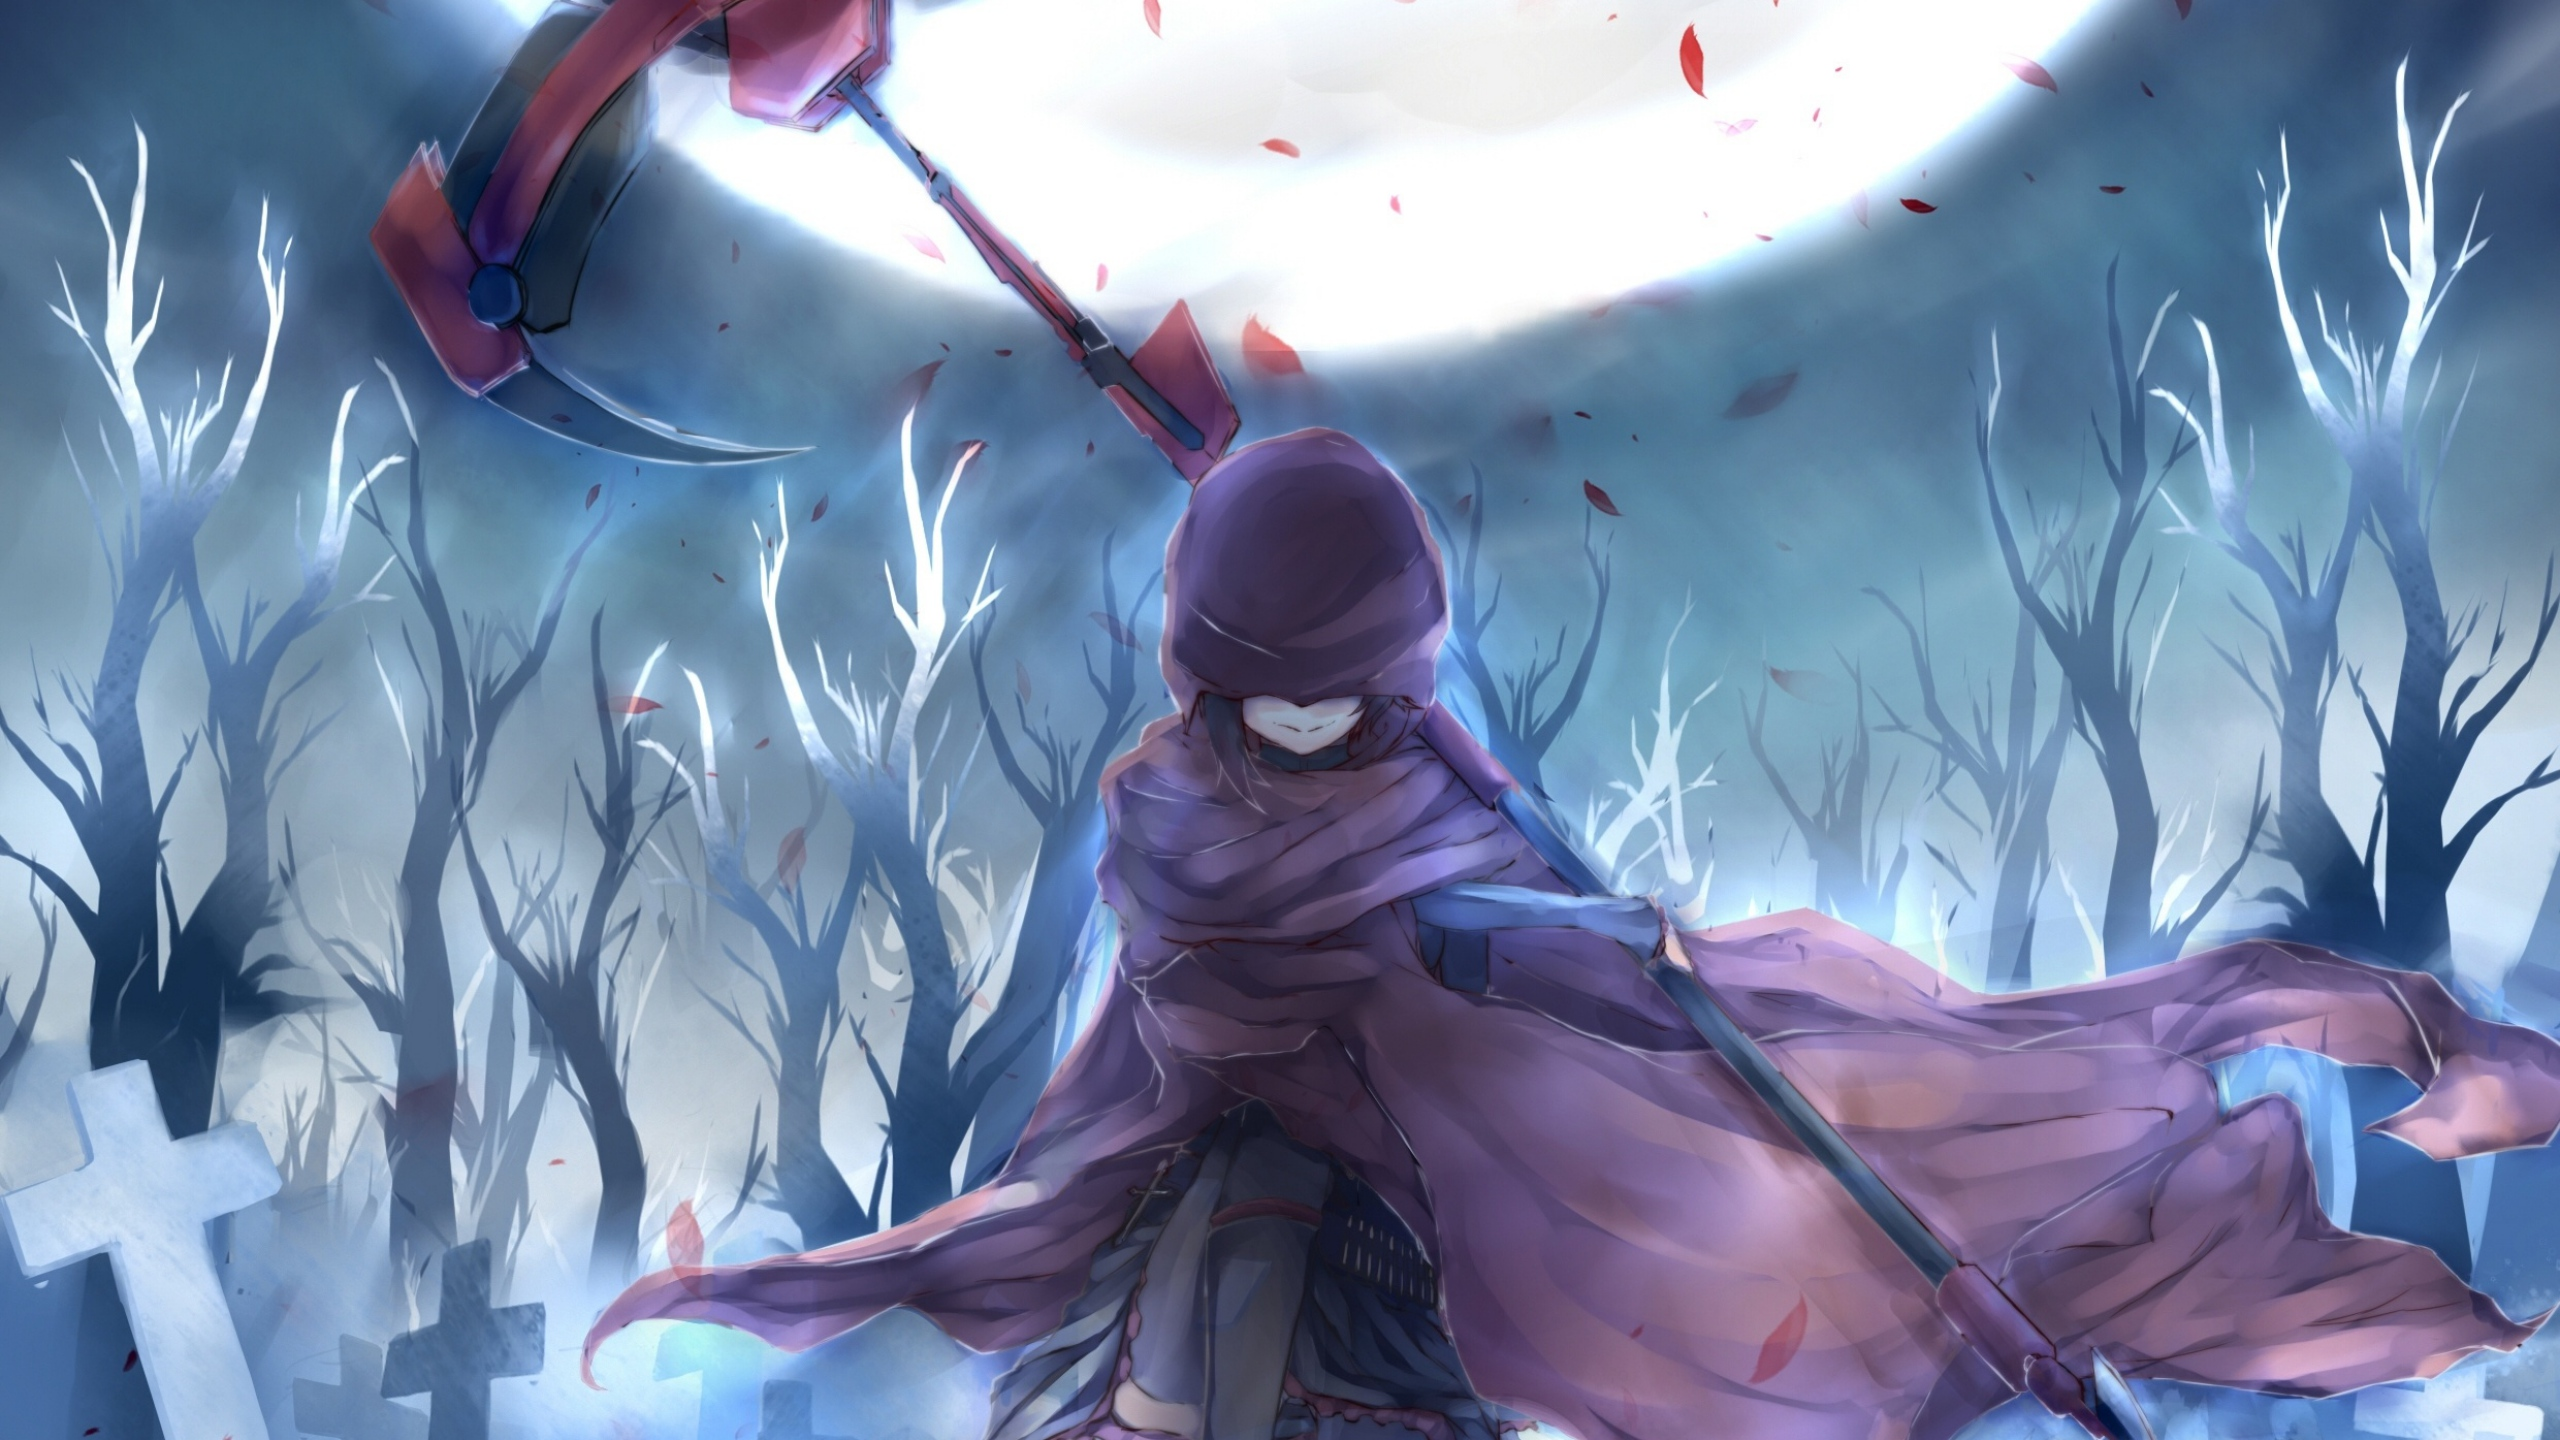 2560 x 1440 Wallpaper Anime - WallpaperSafari